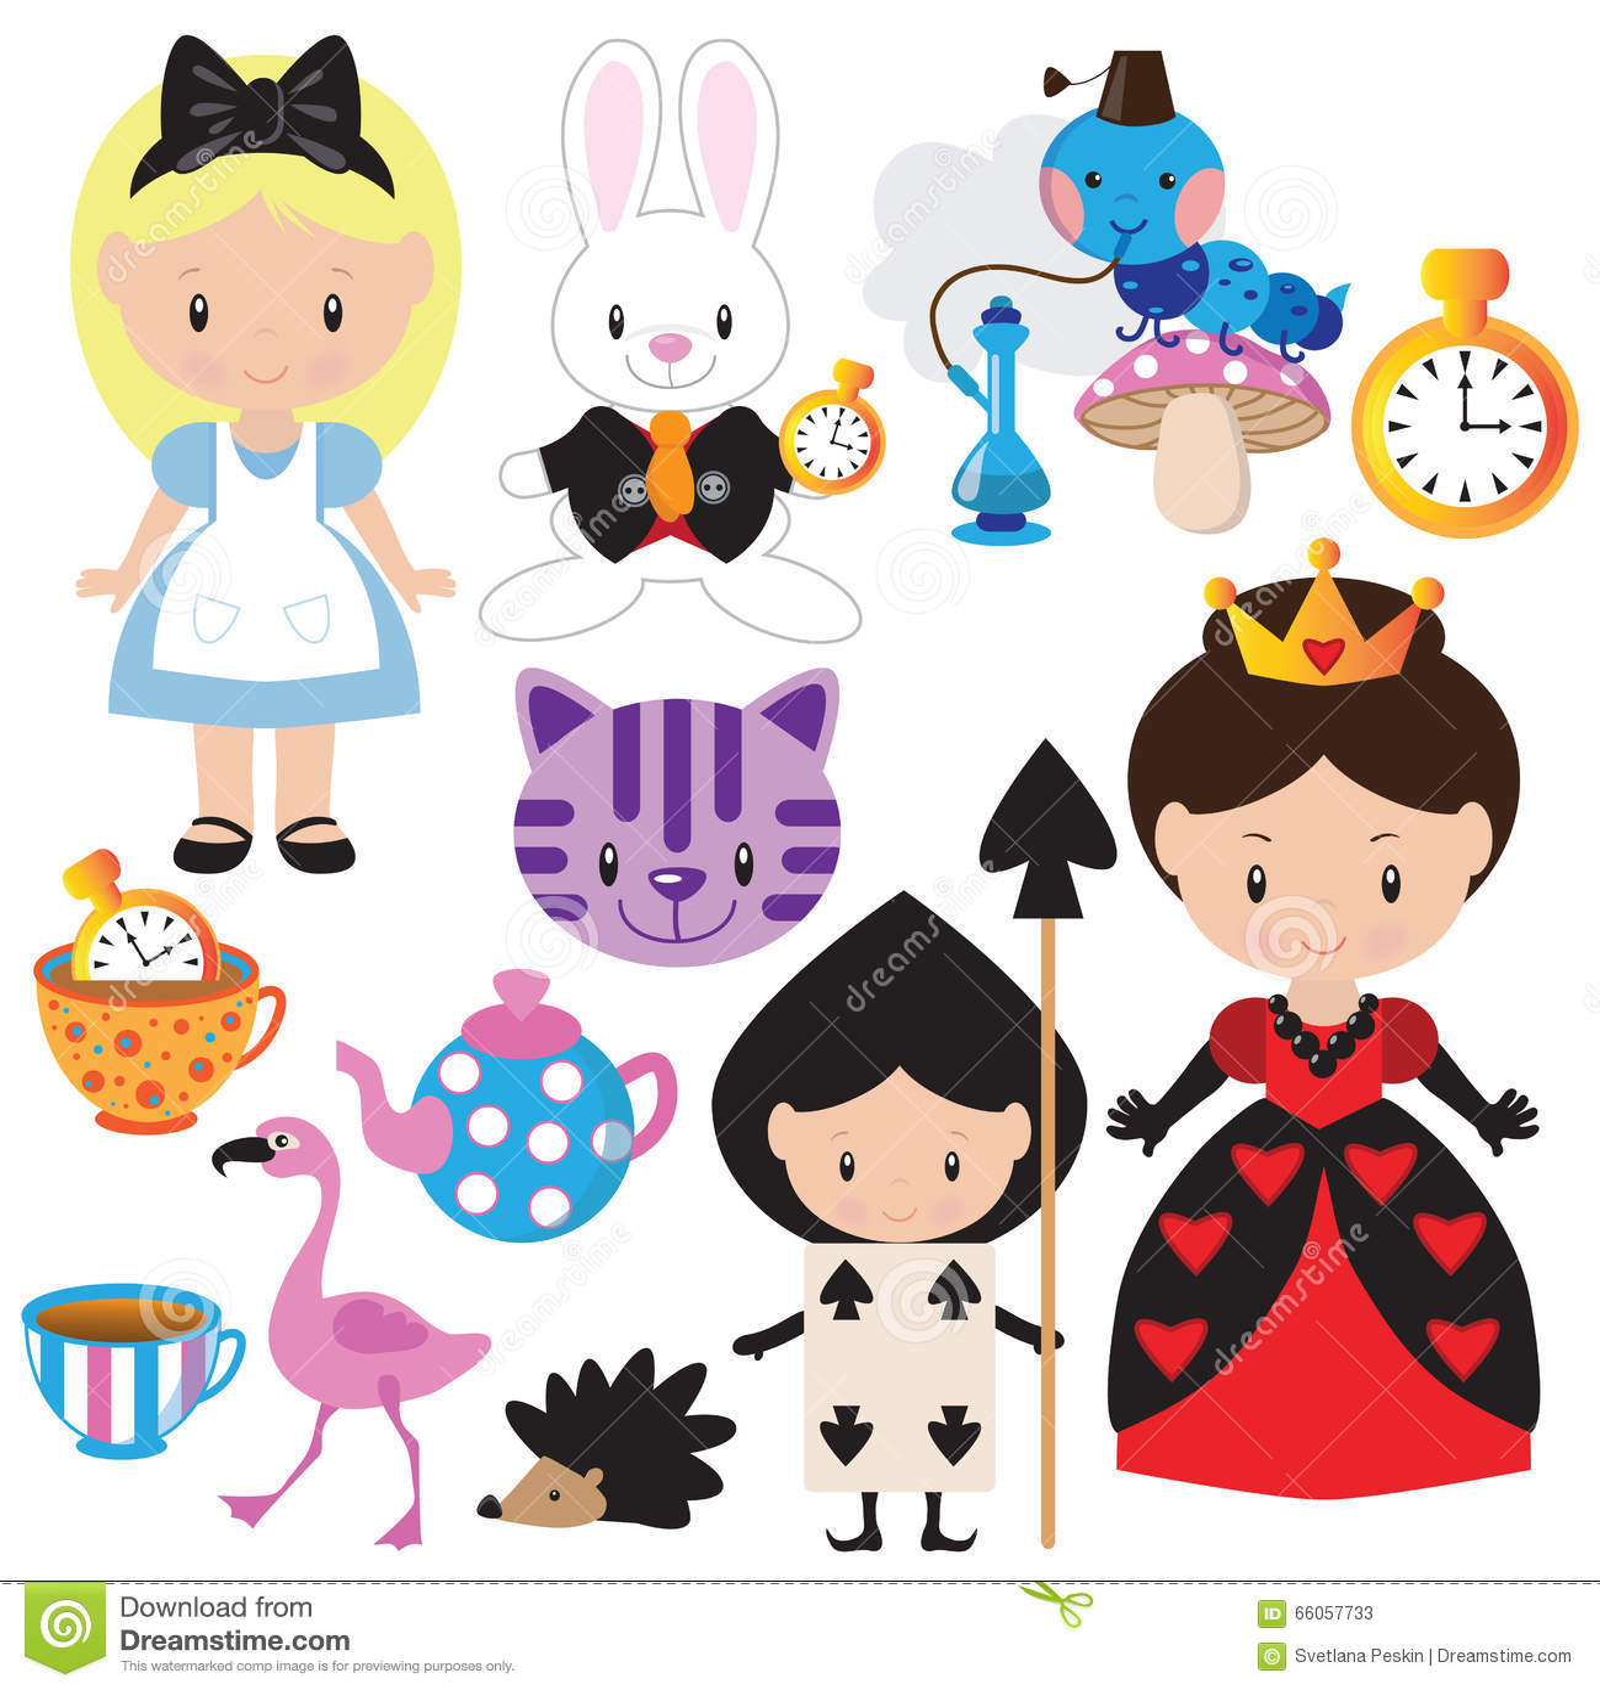 Alice in wonderland vector illustration stock vector for Drawing websites no download